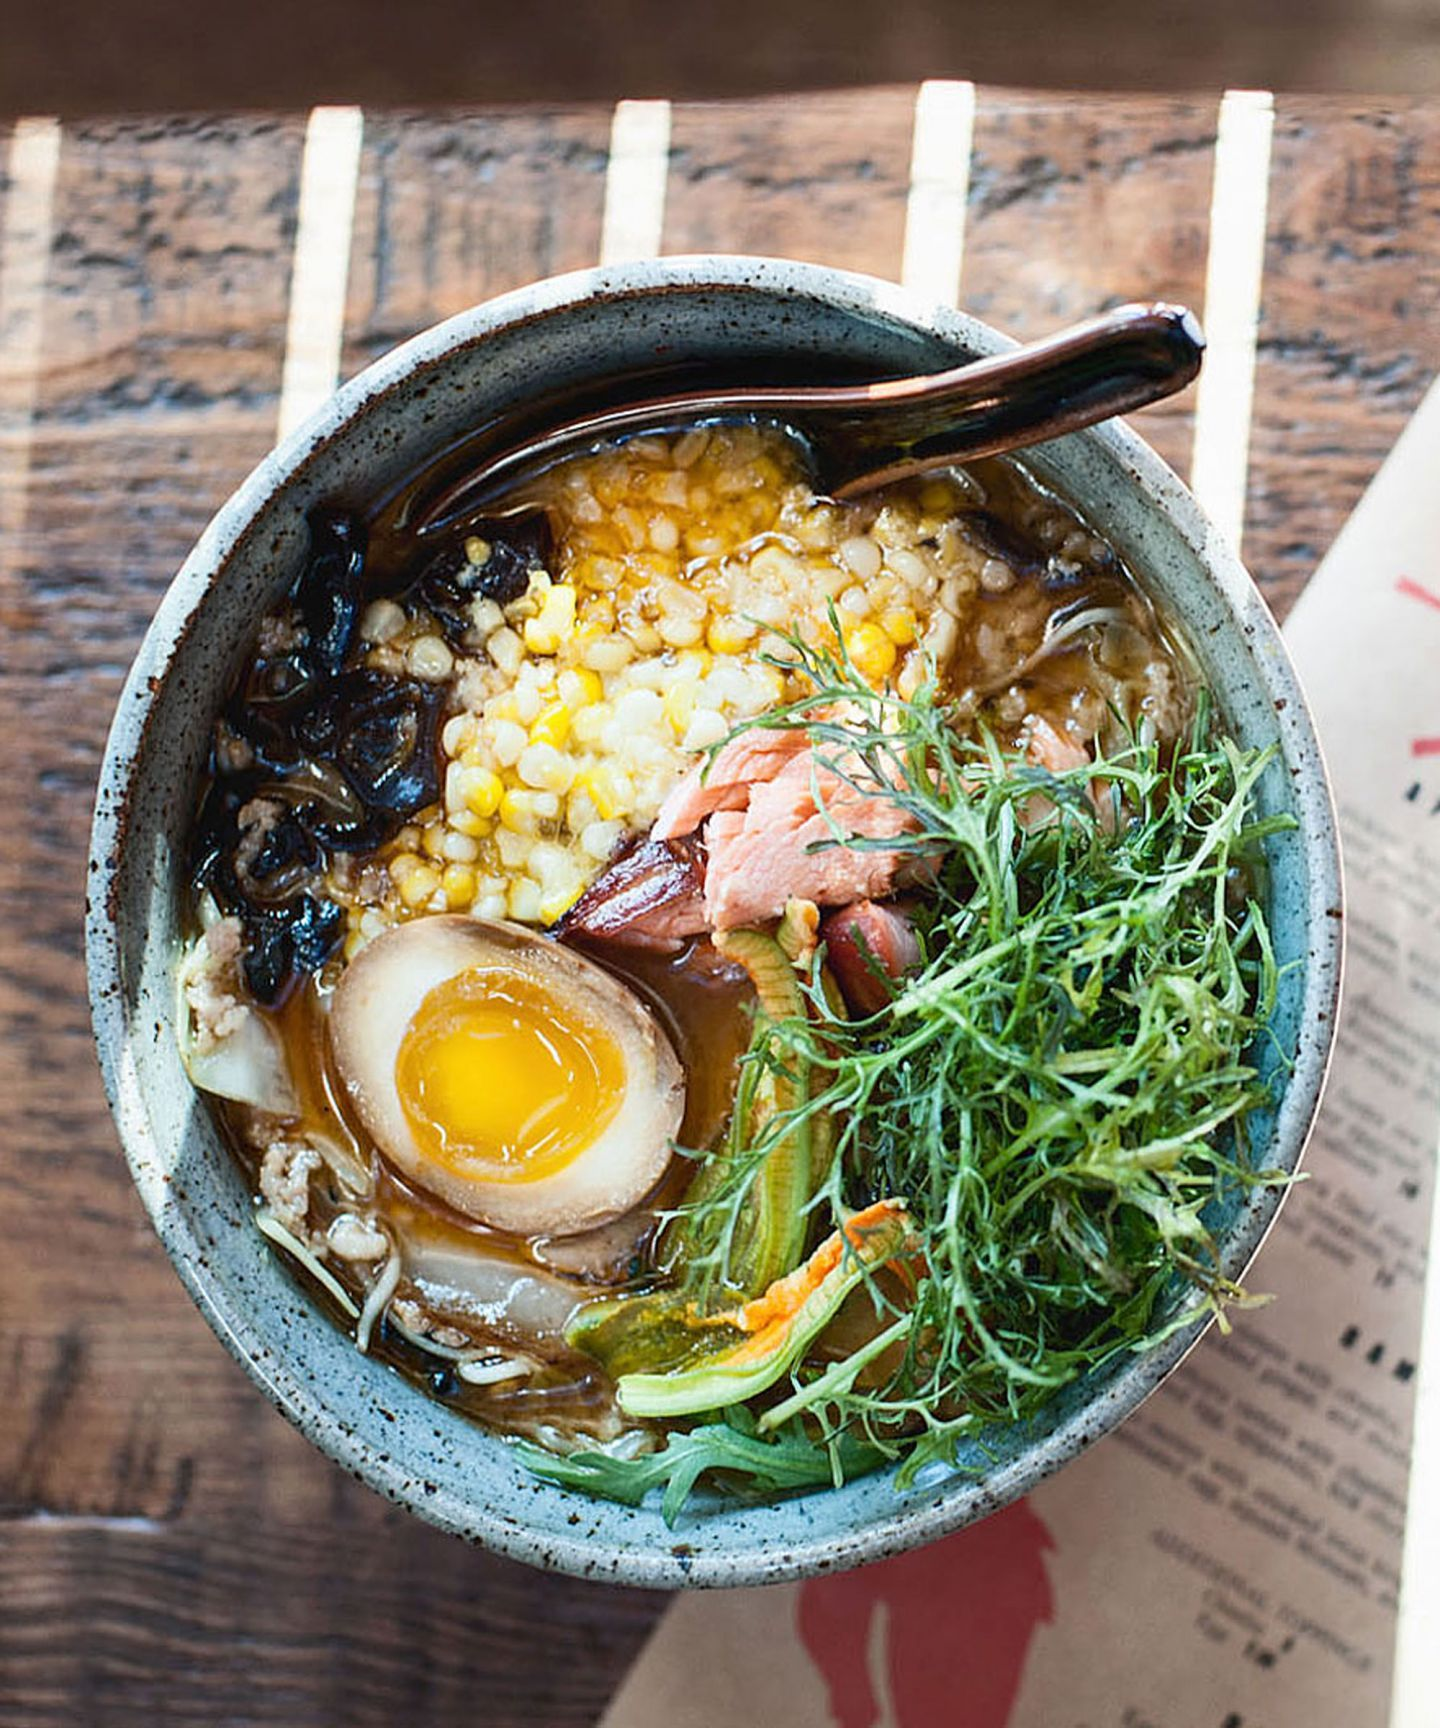 Best ramen nyc ramen restaurants new york city in 2020